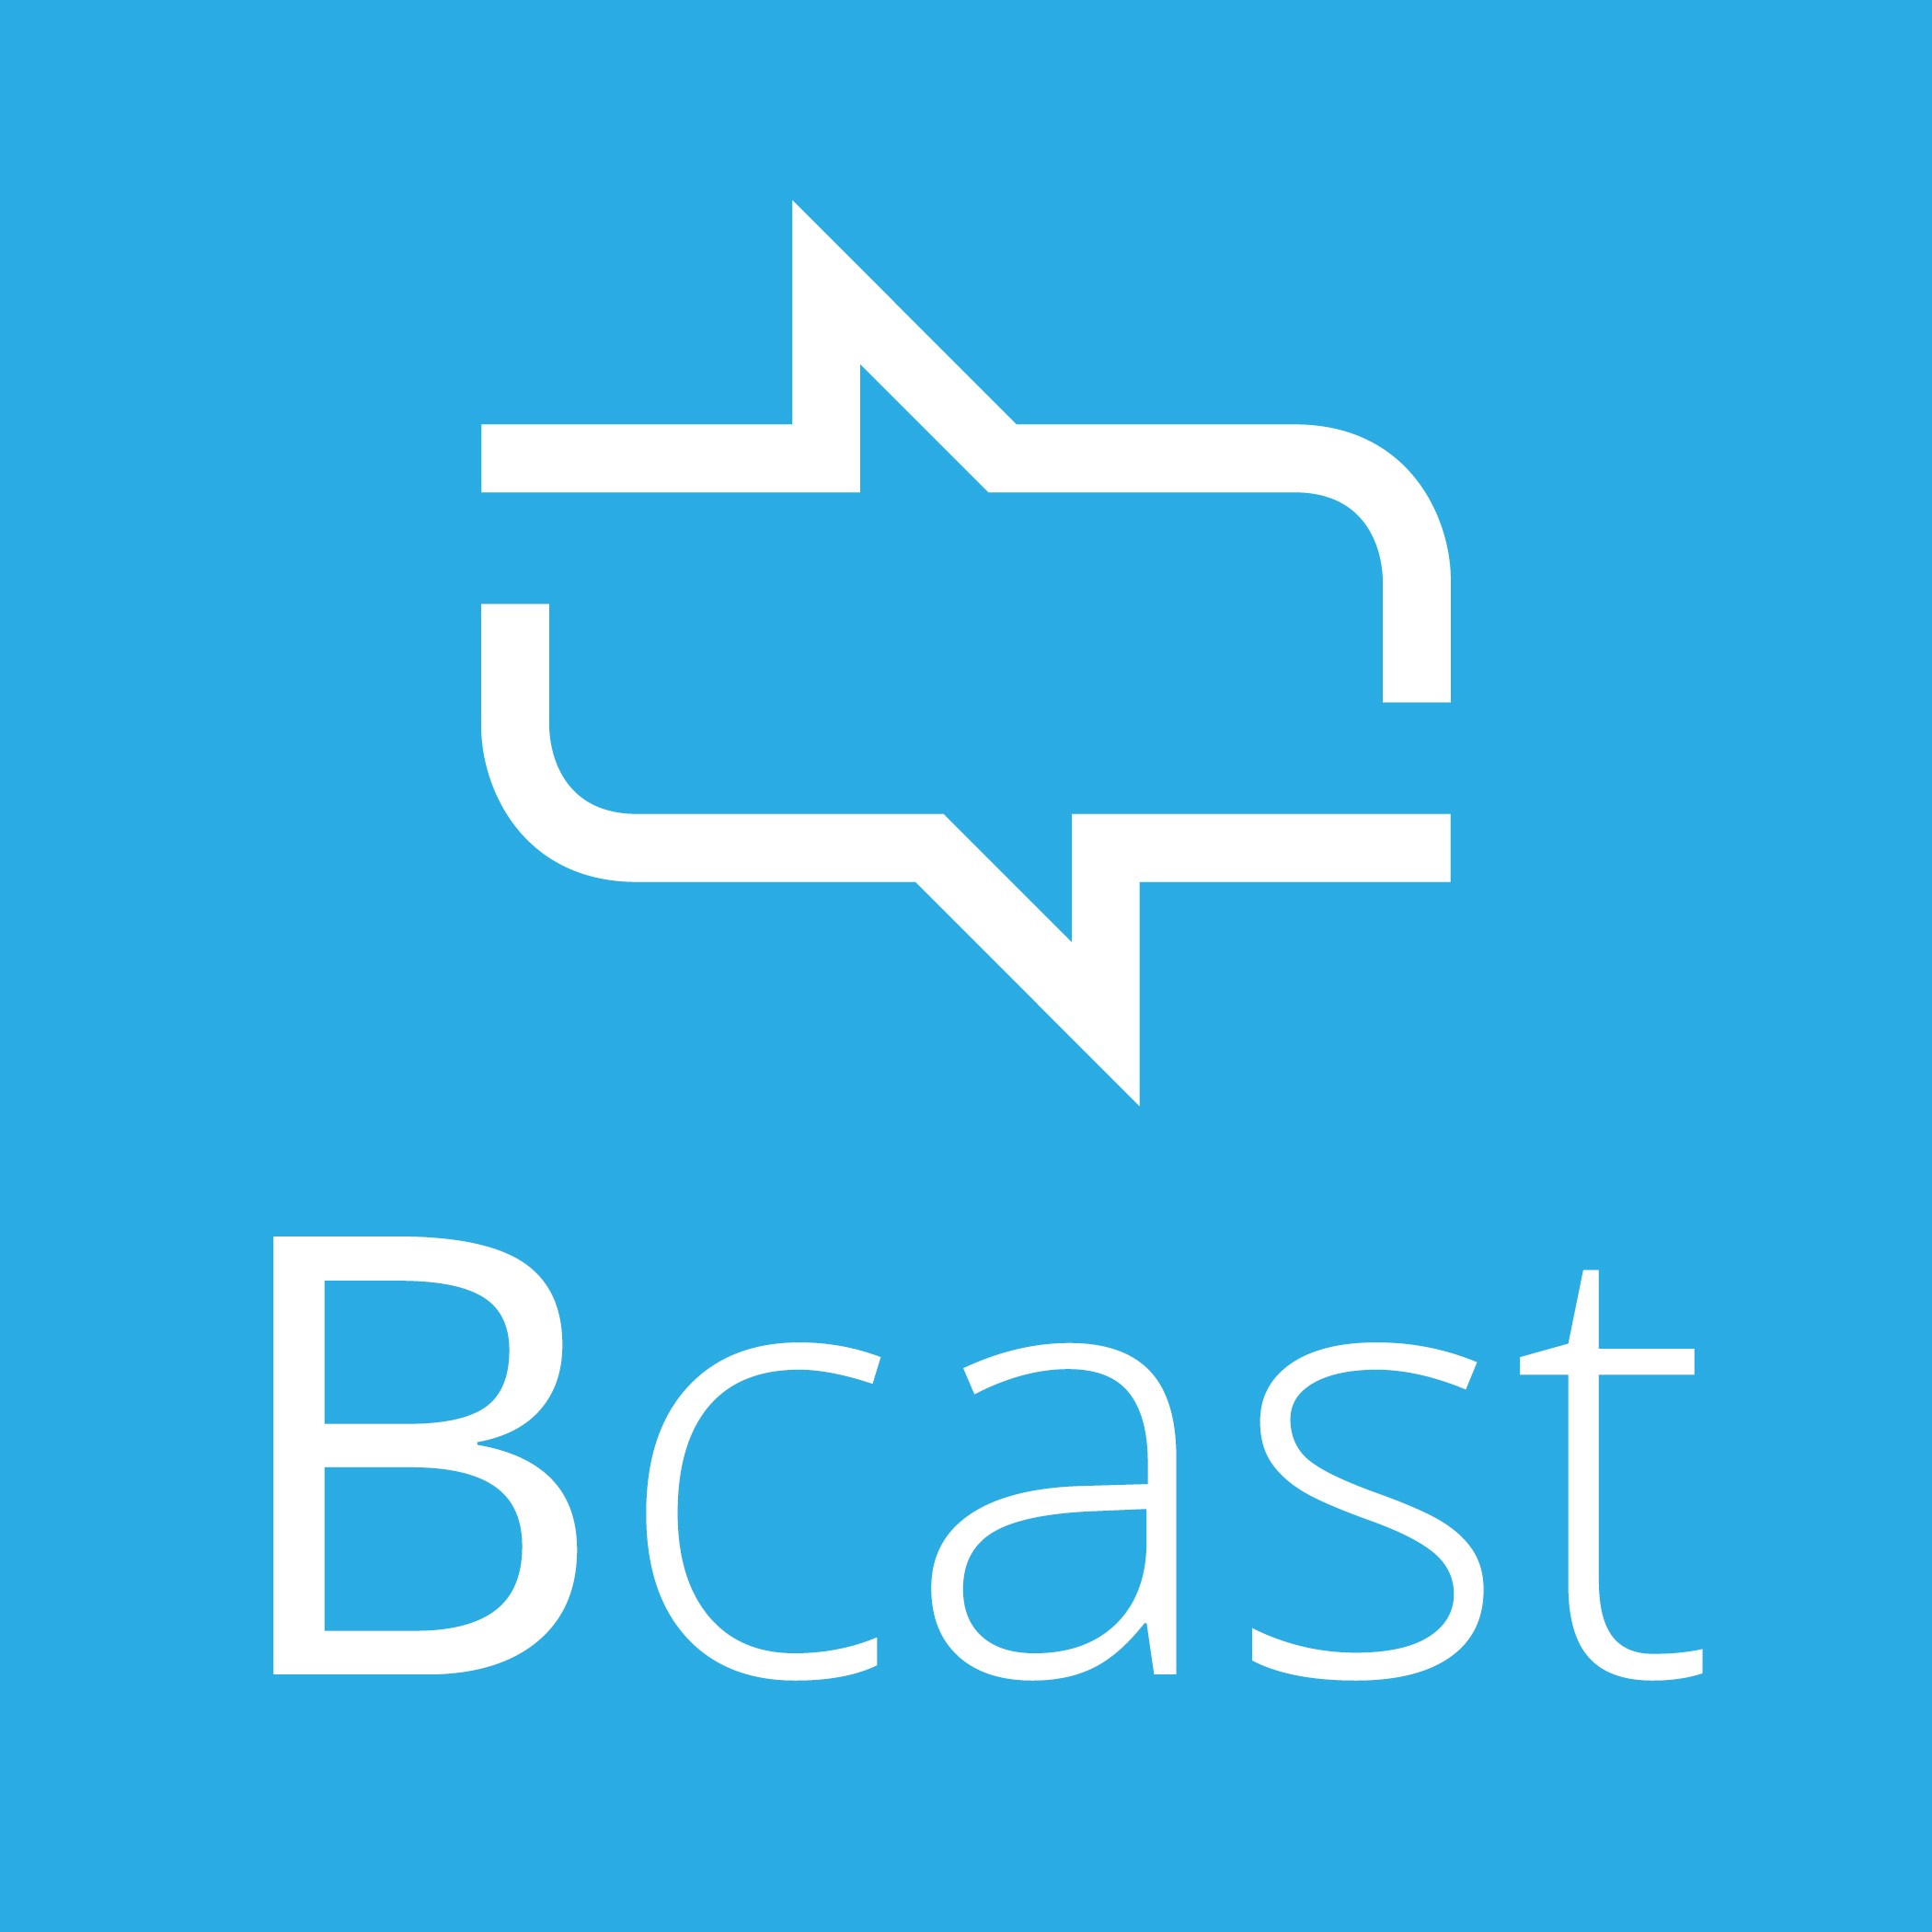 The Bcast